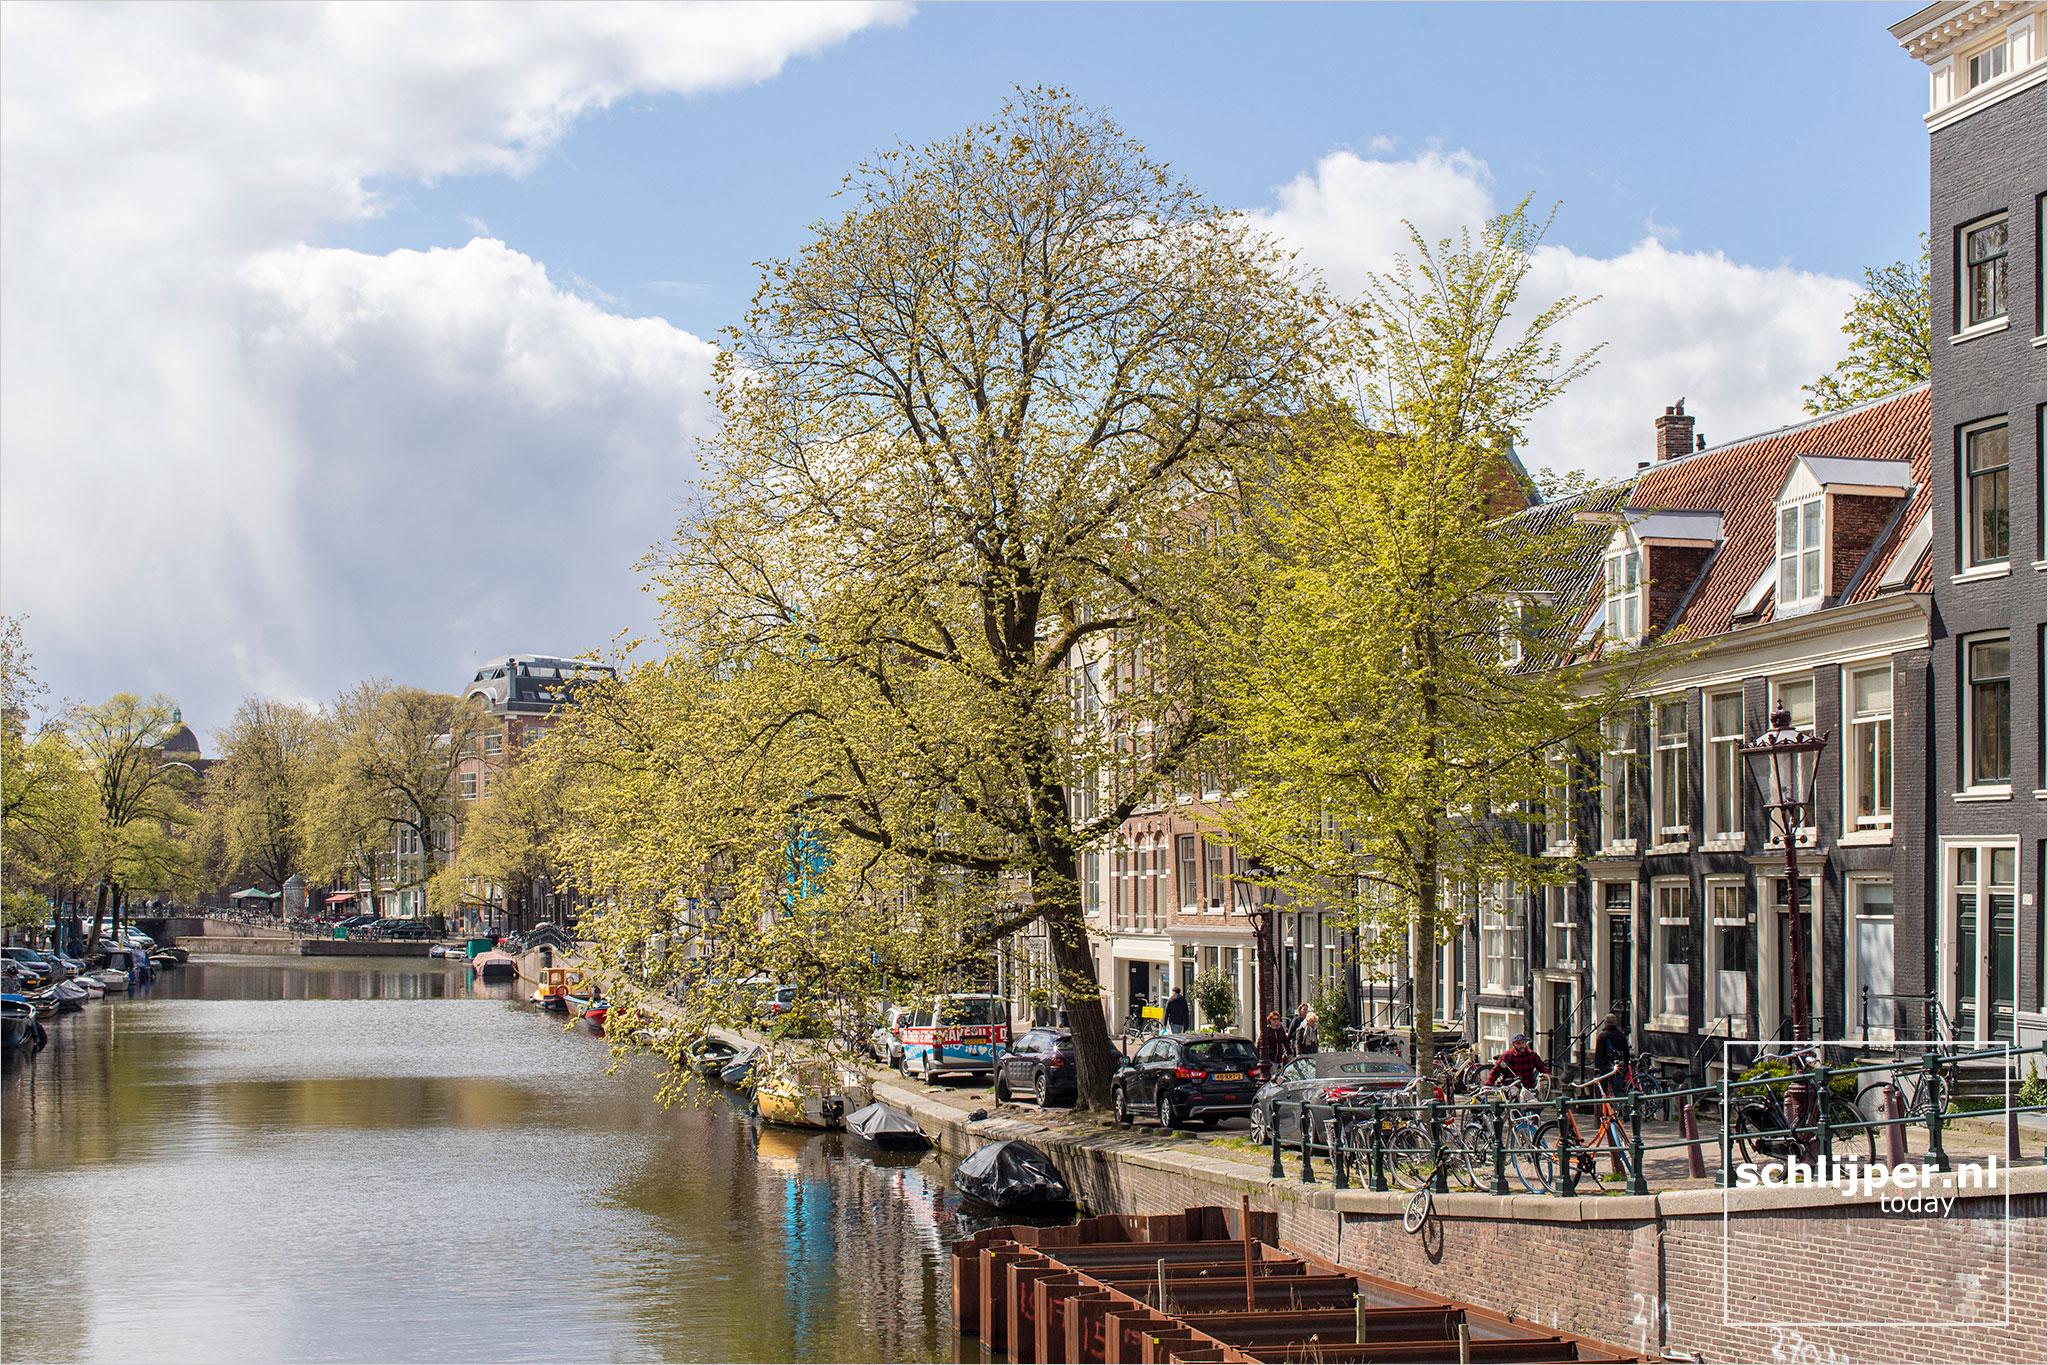 The Netherlands, Amsterdam, 3 mei 2021